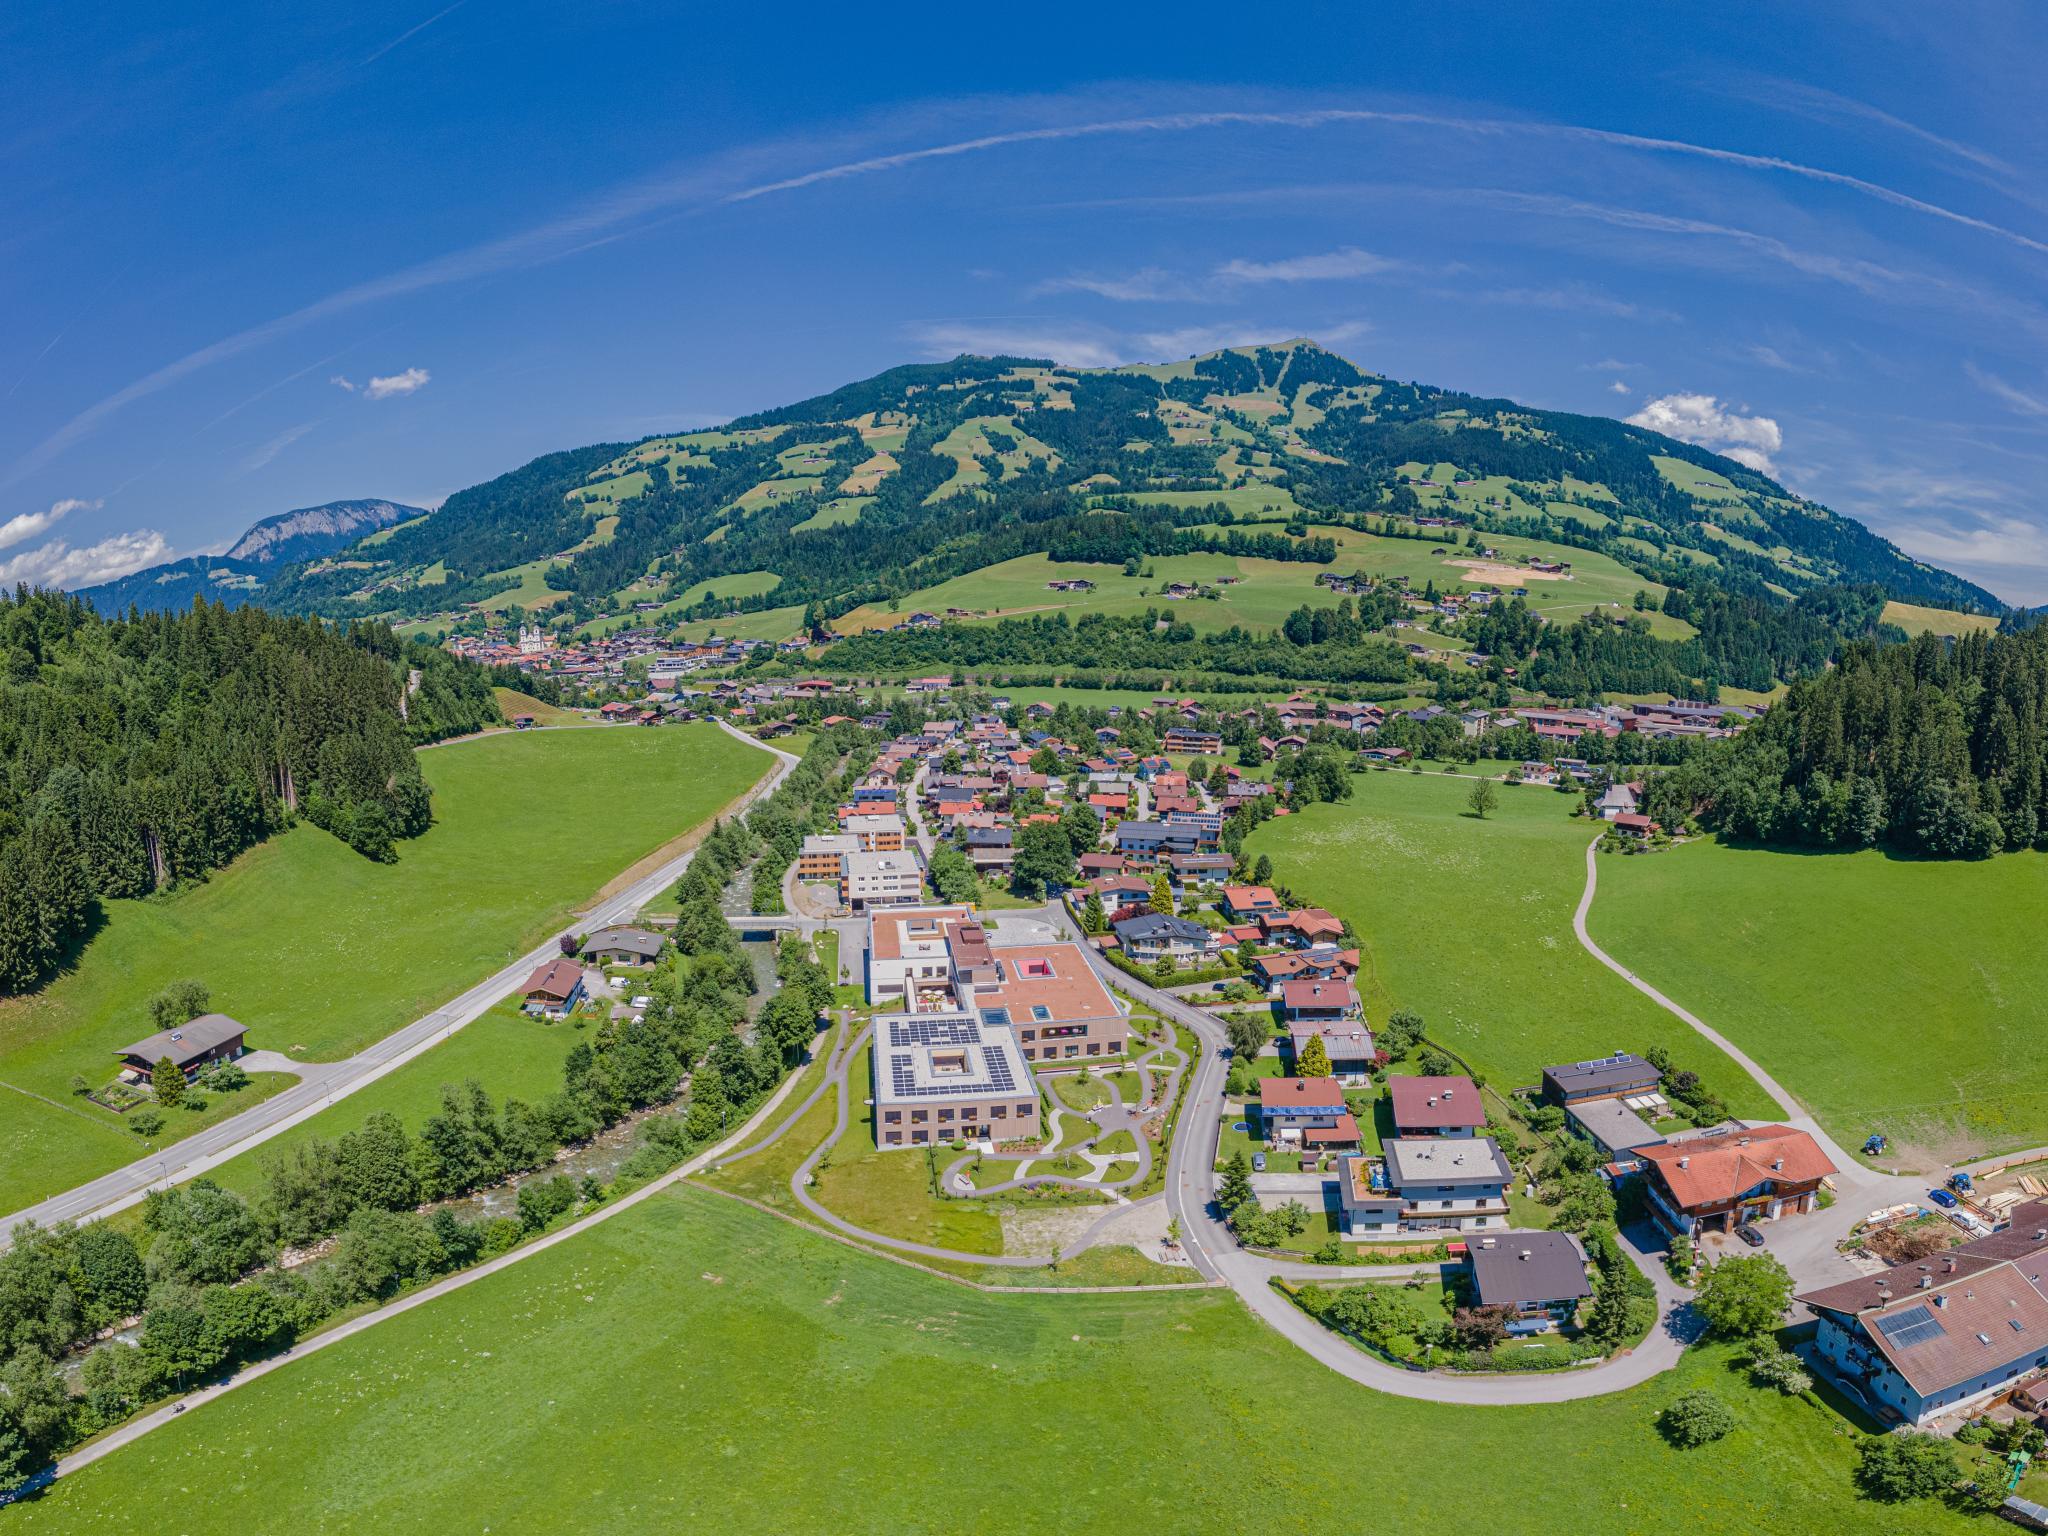 Tirola Bude Lisi Top 3 Tirol